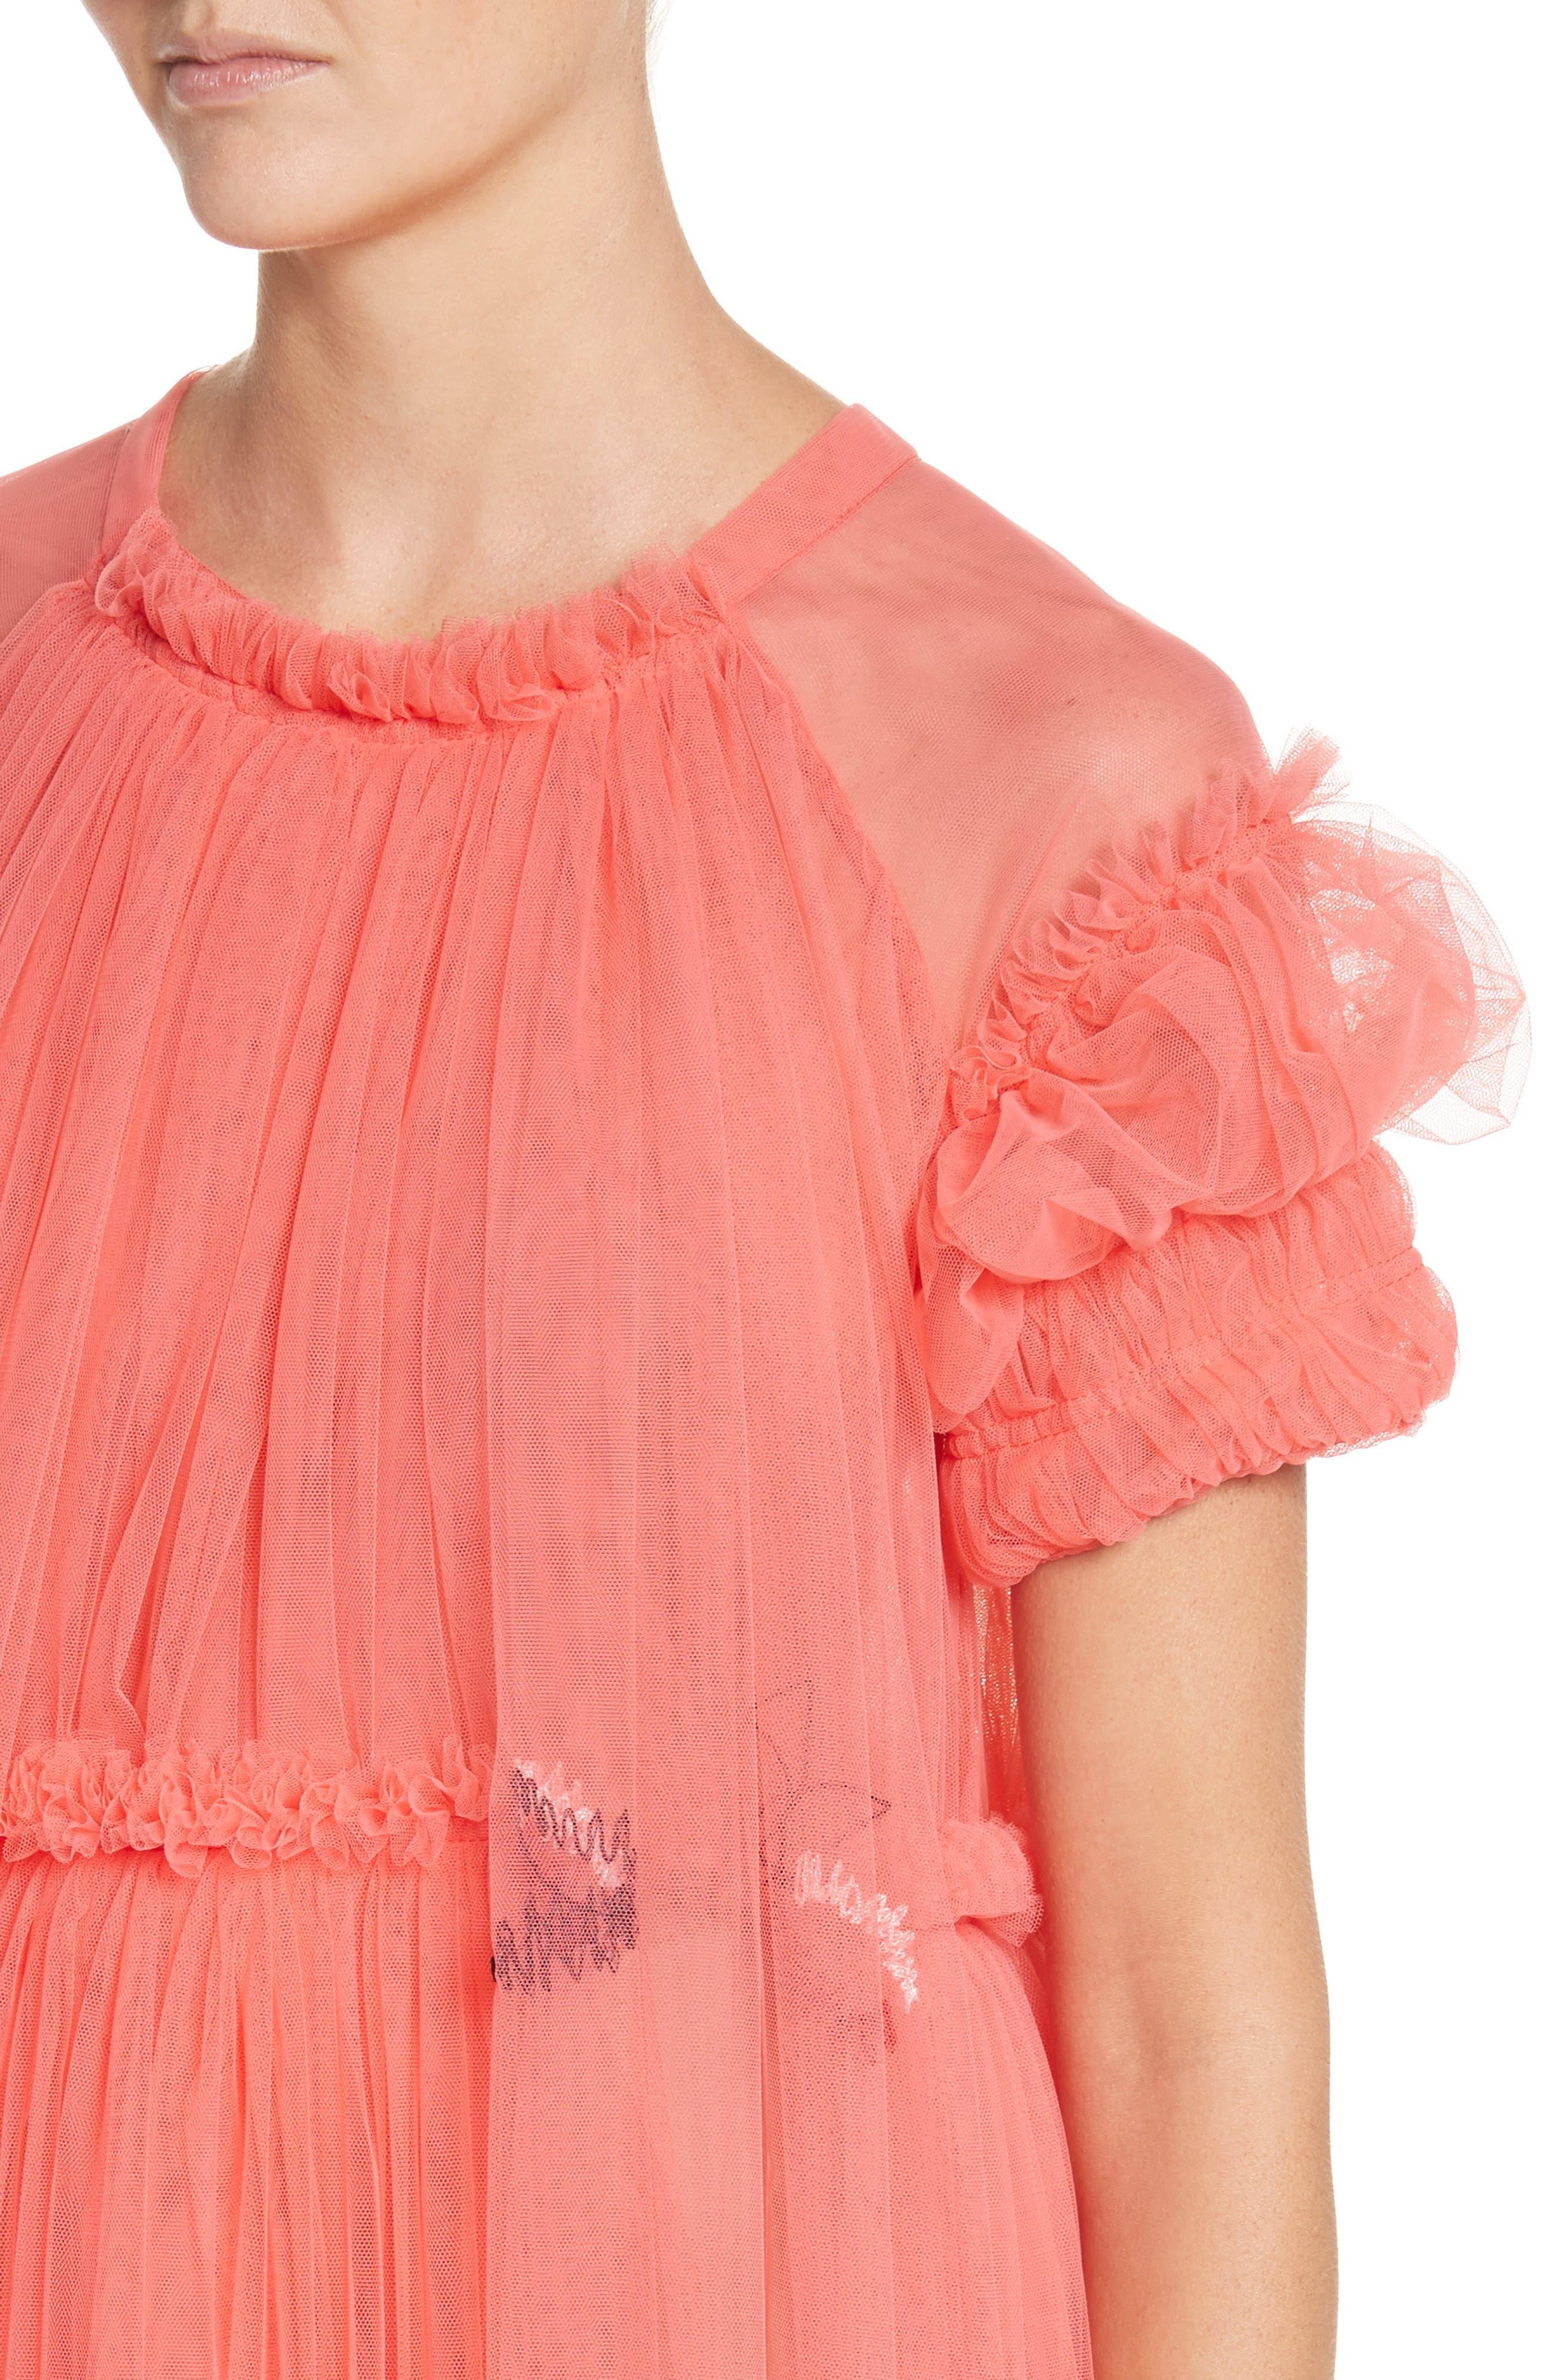 Doris Embroidered Tulle Dress,                             Alternate thumbnail 4, color,                             950